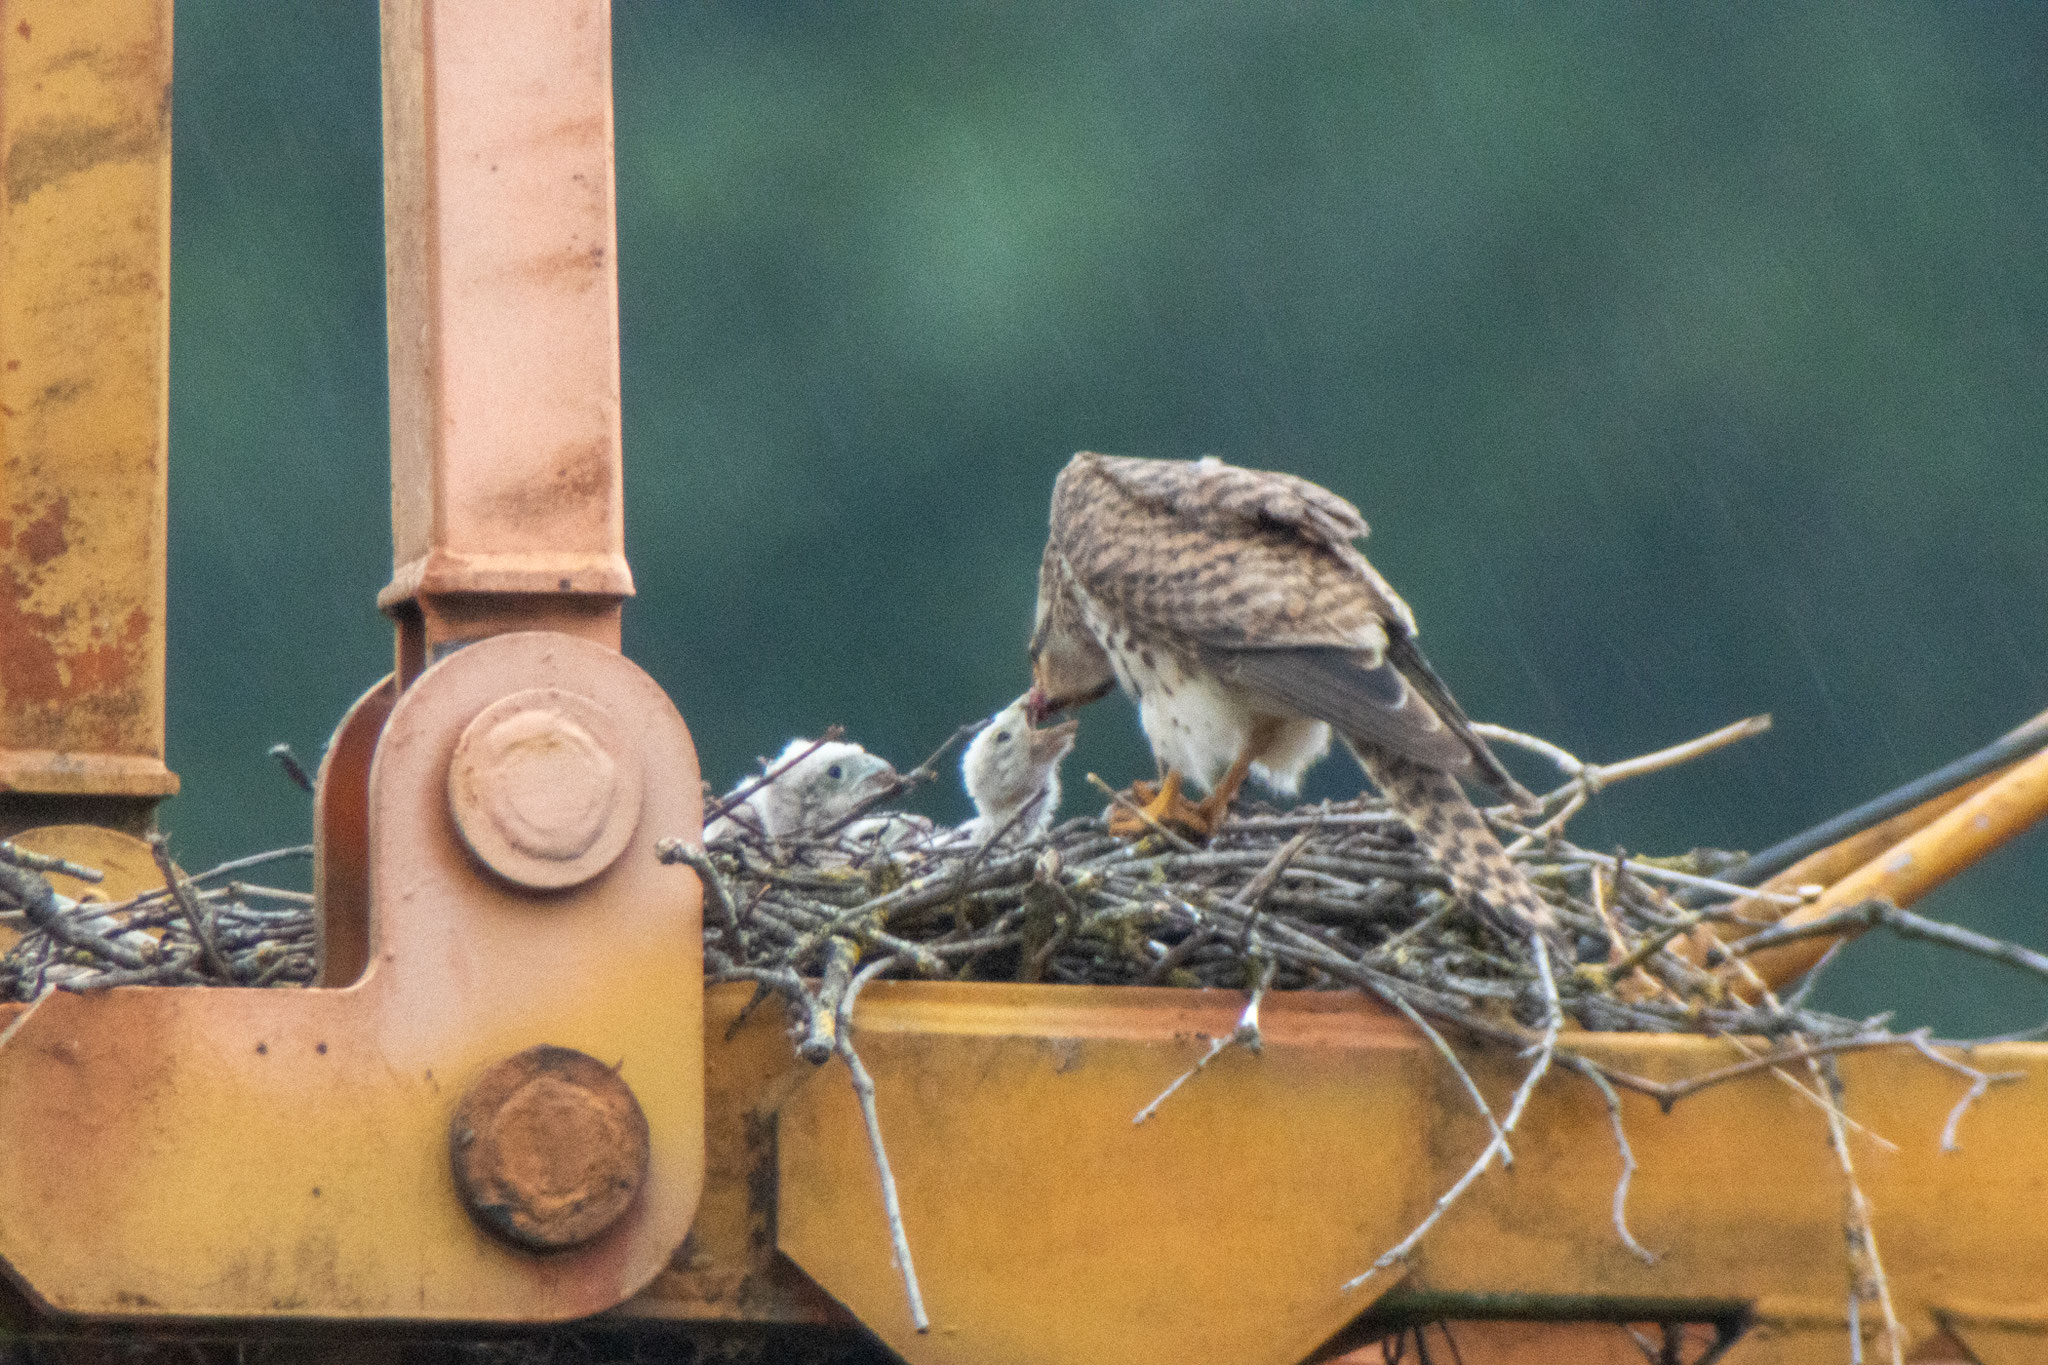 Jungvogelfütterung am 04.06.20 (Foto: B. Budig)